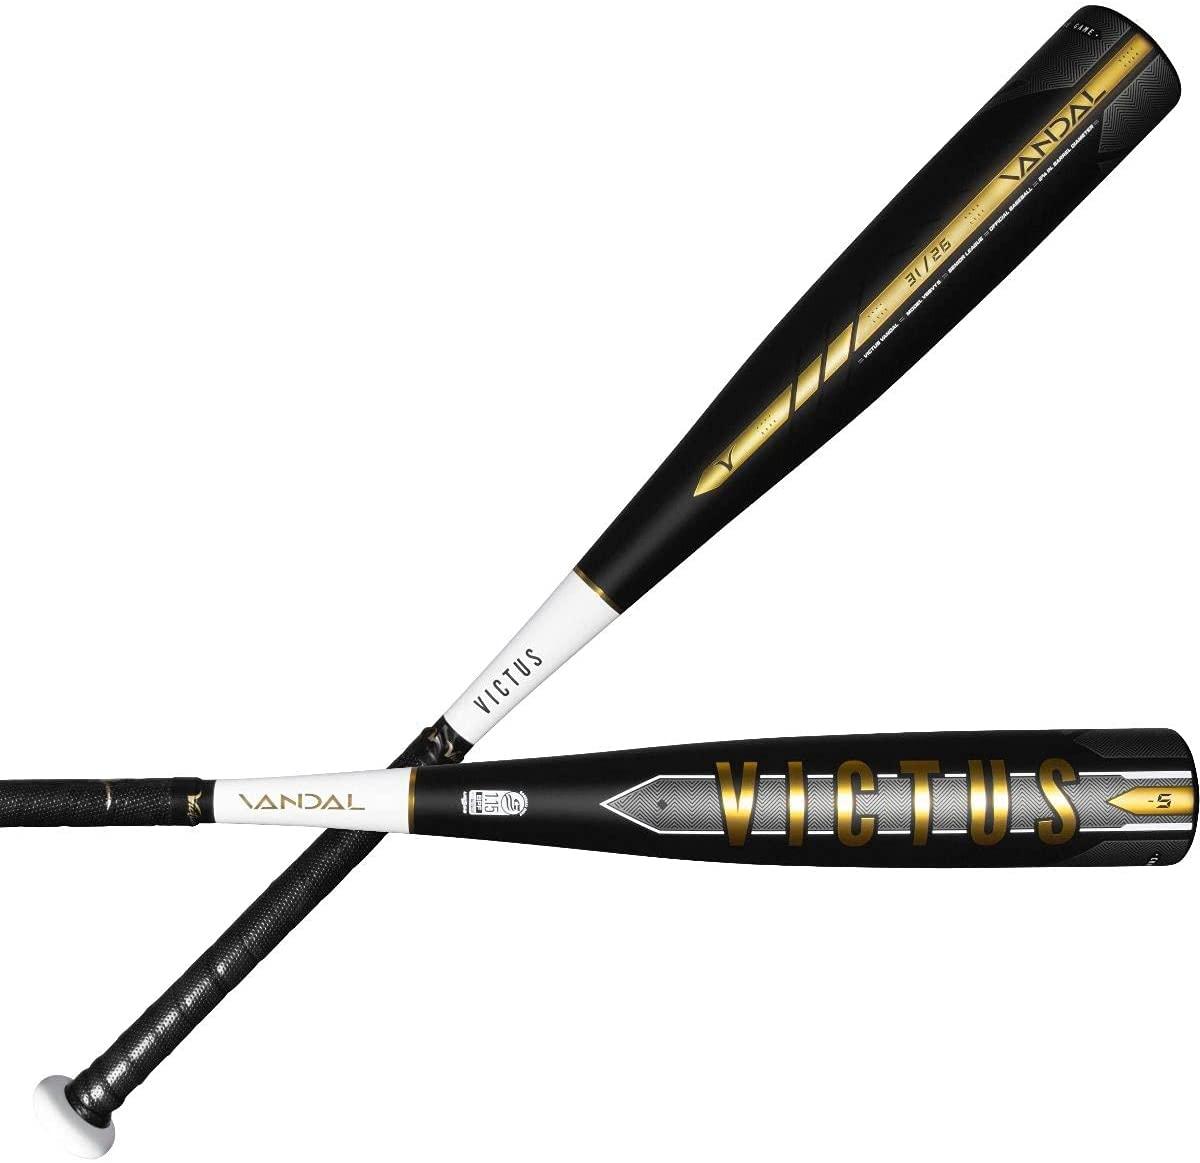 victus-vandal-5-baseball-bat-31-inch-26-oz VSBVY5-3126   <ul class=a-unordered-list a-vertical a-spacing-mini> <li><span class=a-list-item>Consistency and craftsmanship</span></li> <li><span class=a-list-item>Commitment to